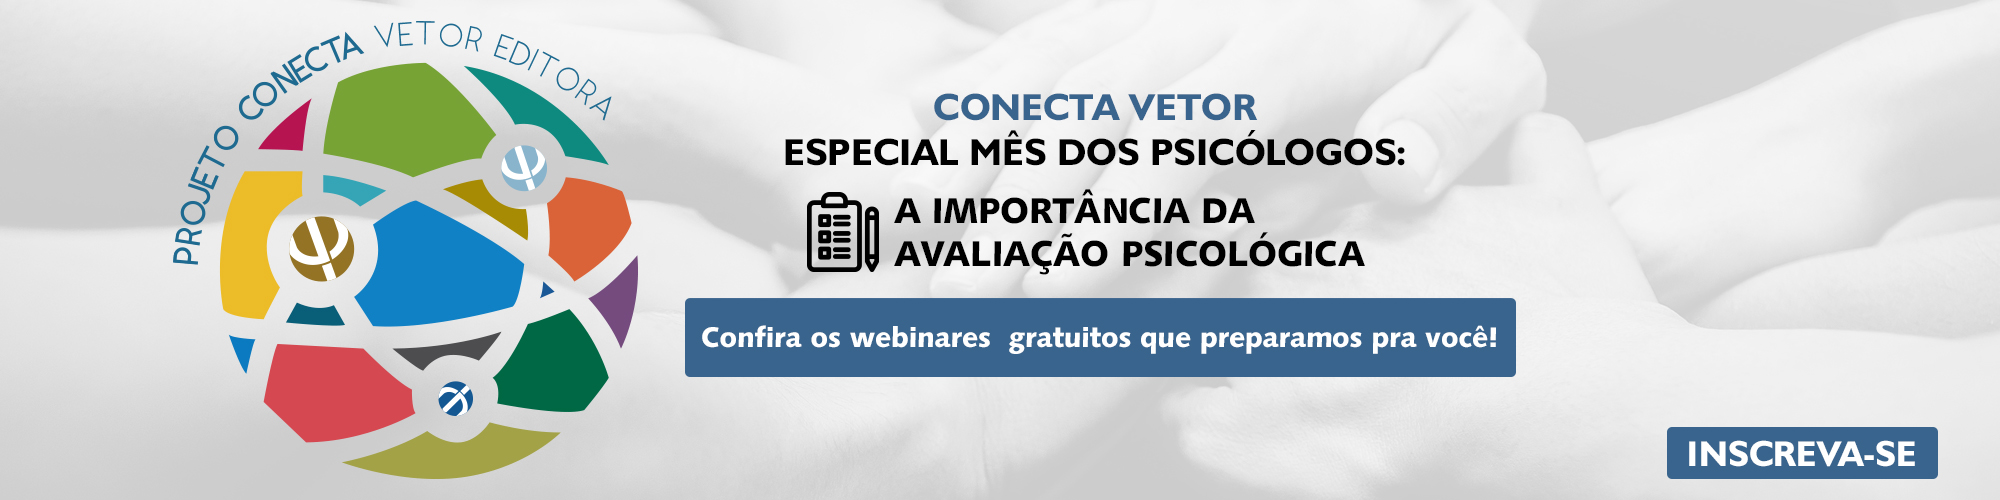 Conecta Vetor